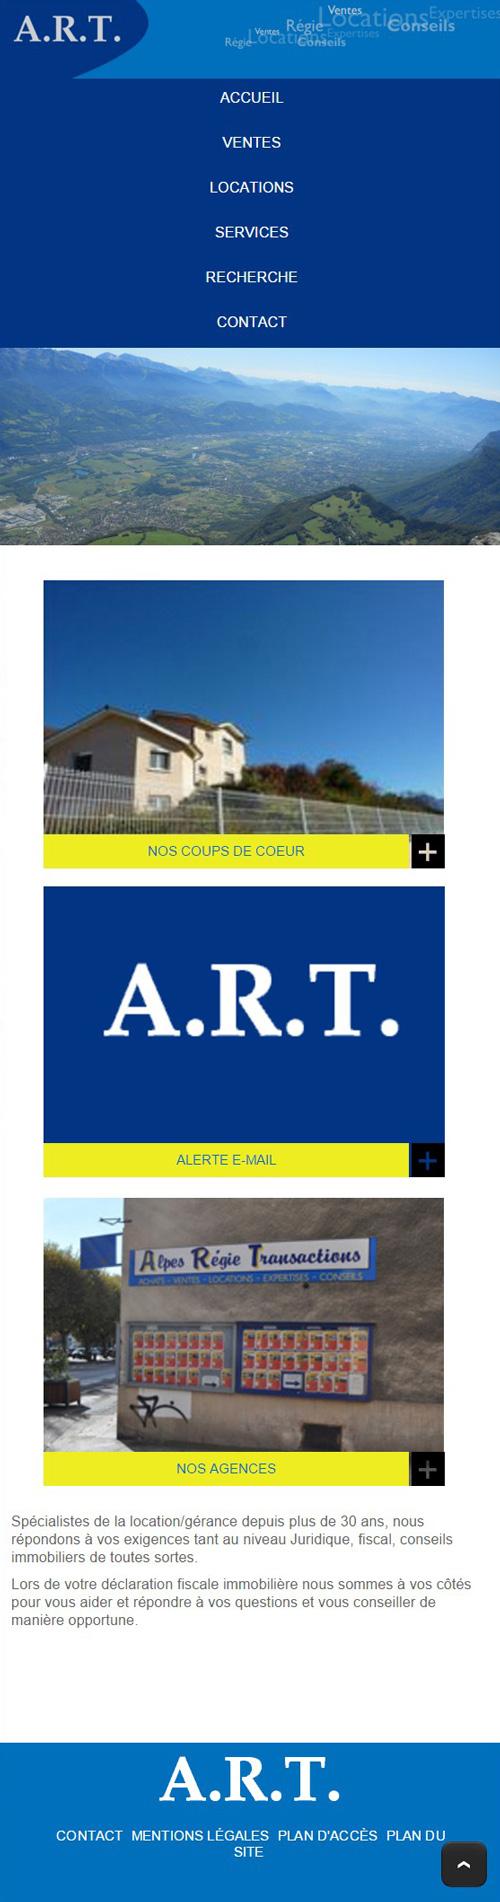 Art Immobilierversion mobile